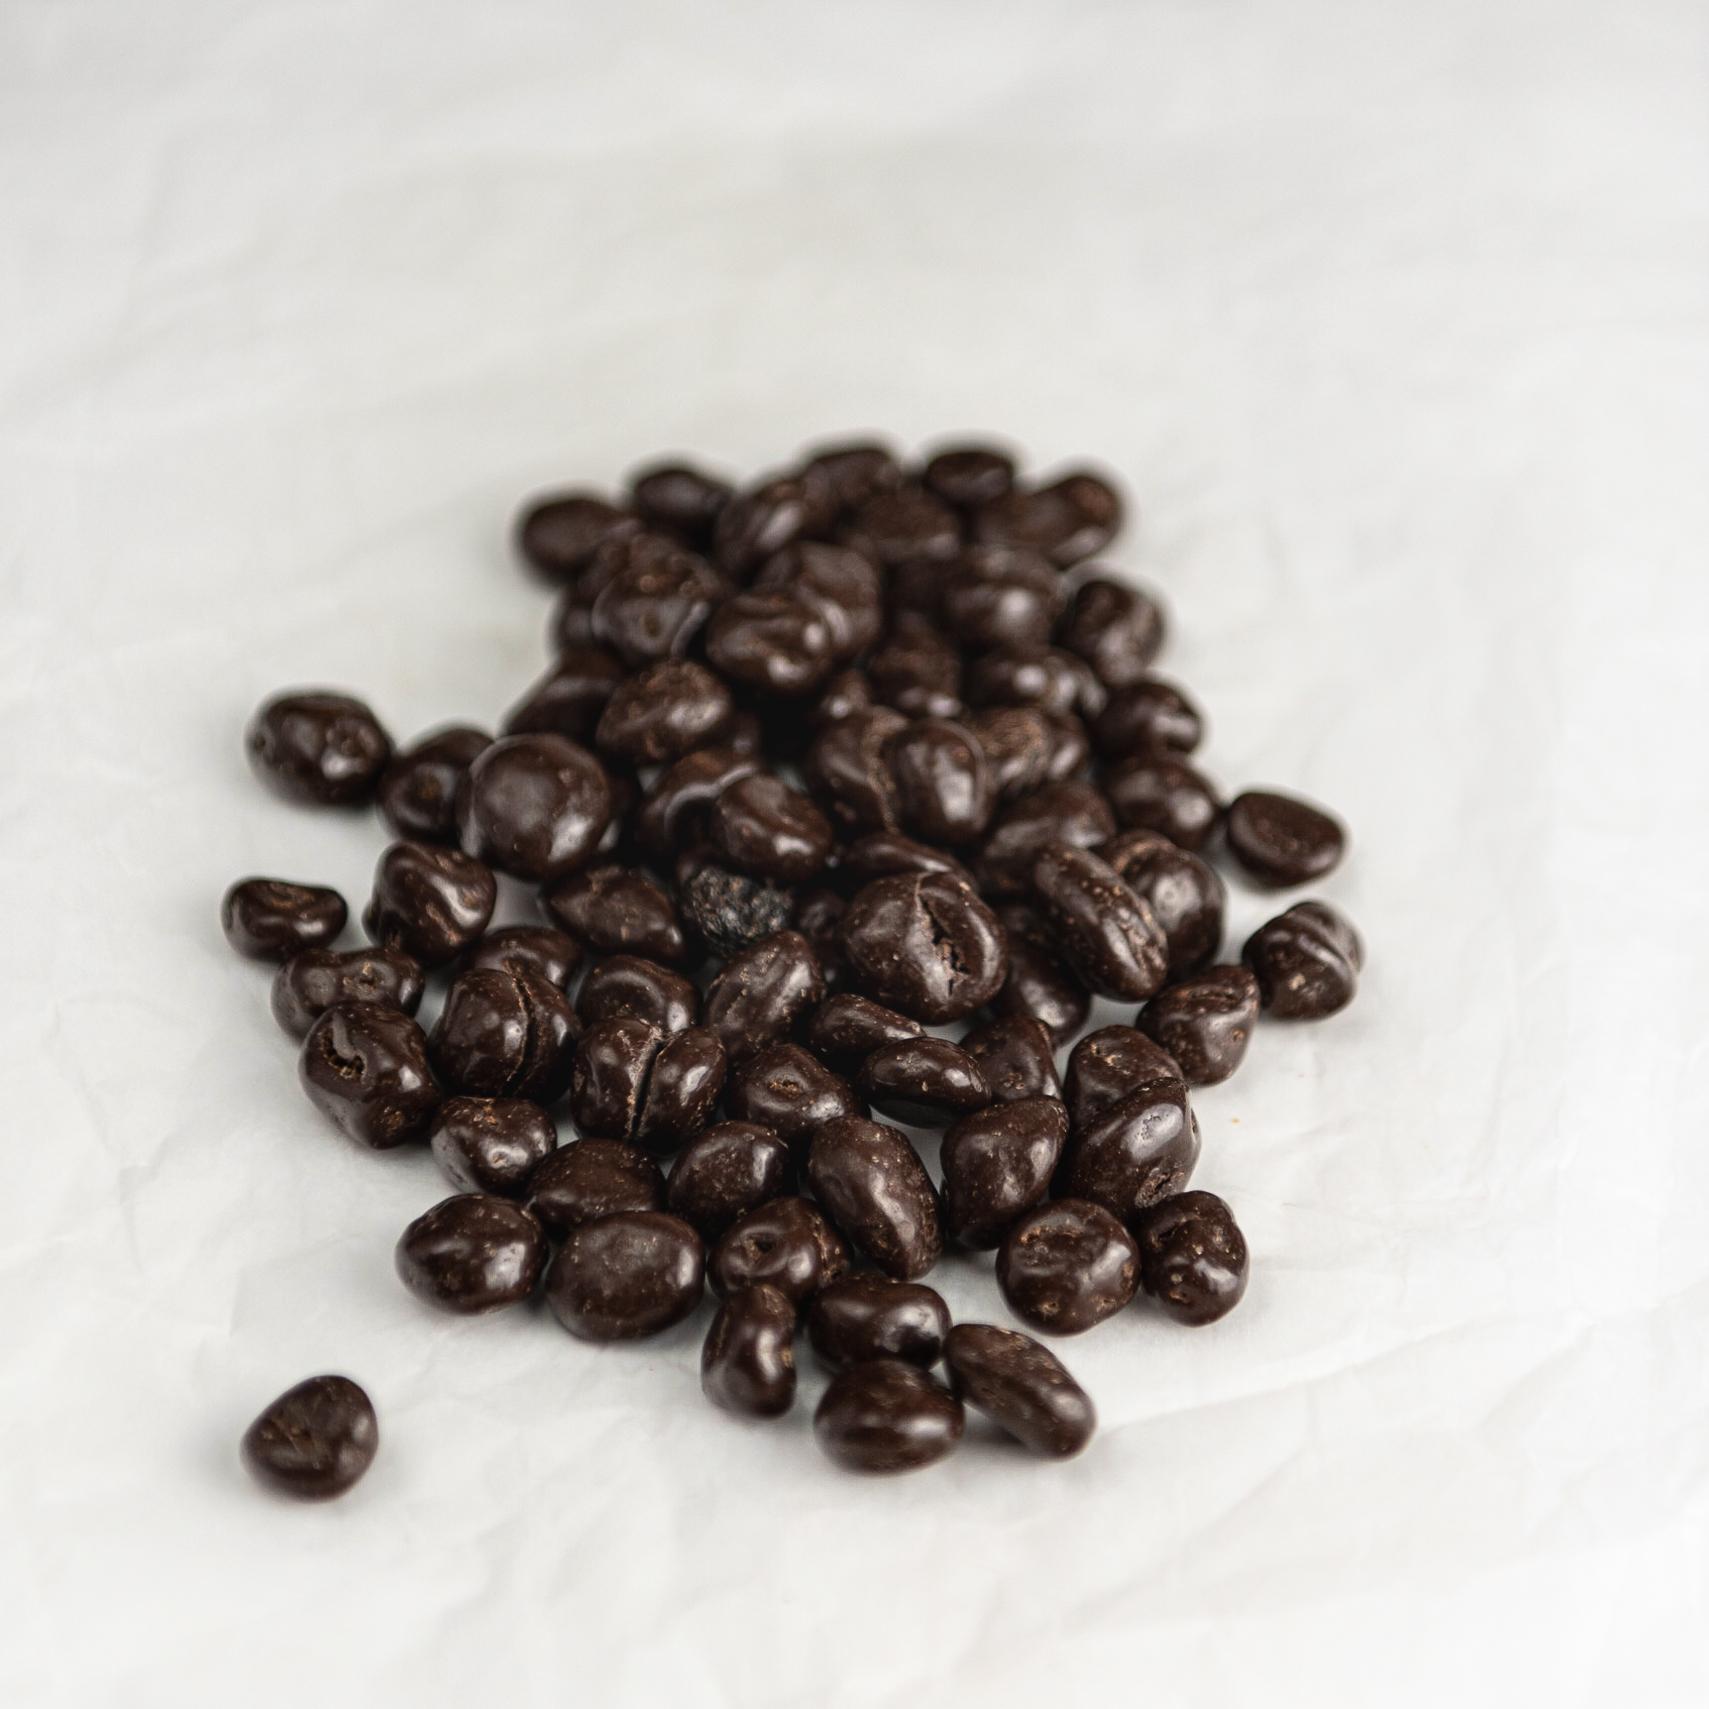 Chocolade jumbo rozijnen | Puur